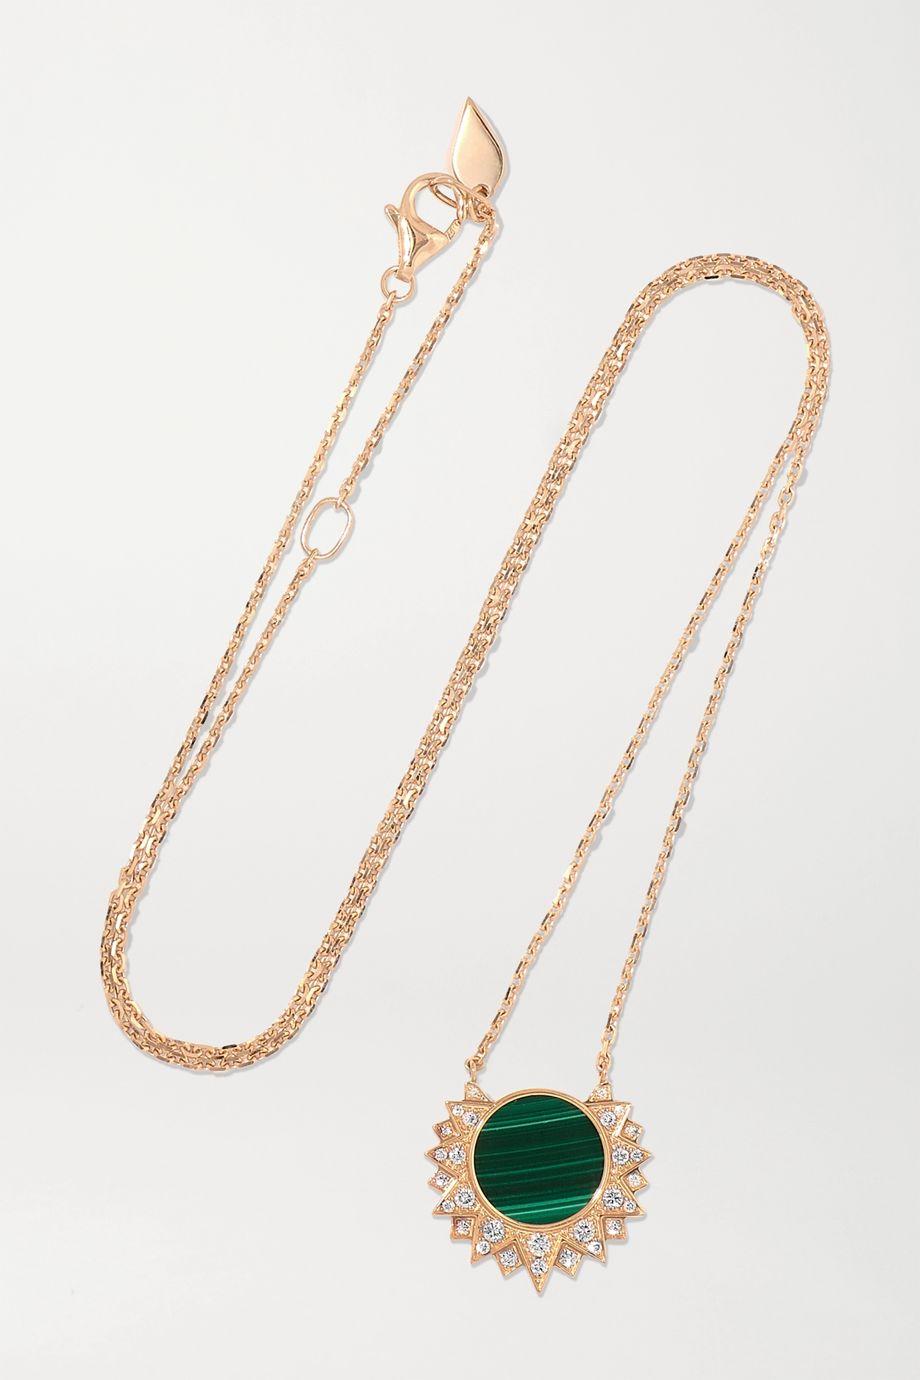 Piaget Sunlight 18-karat rose gold, malachite and diamond necklace